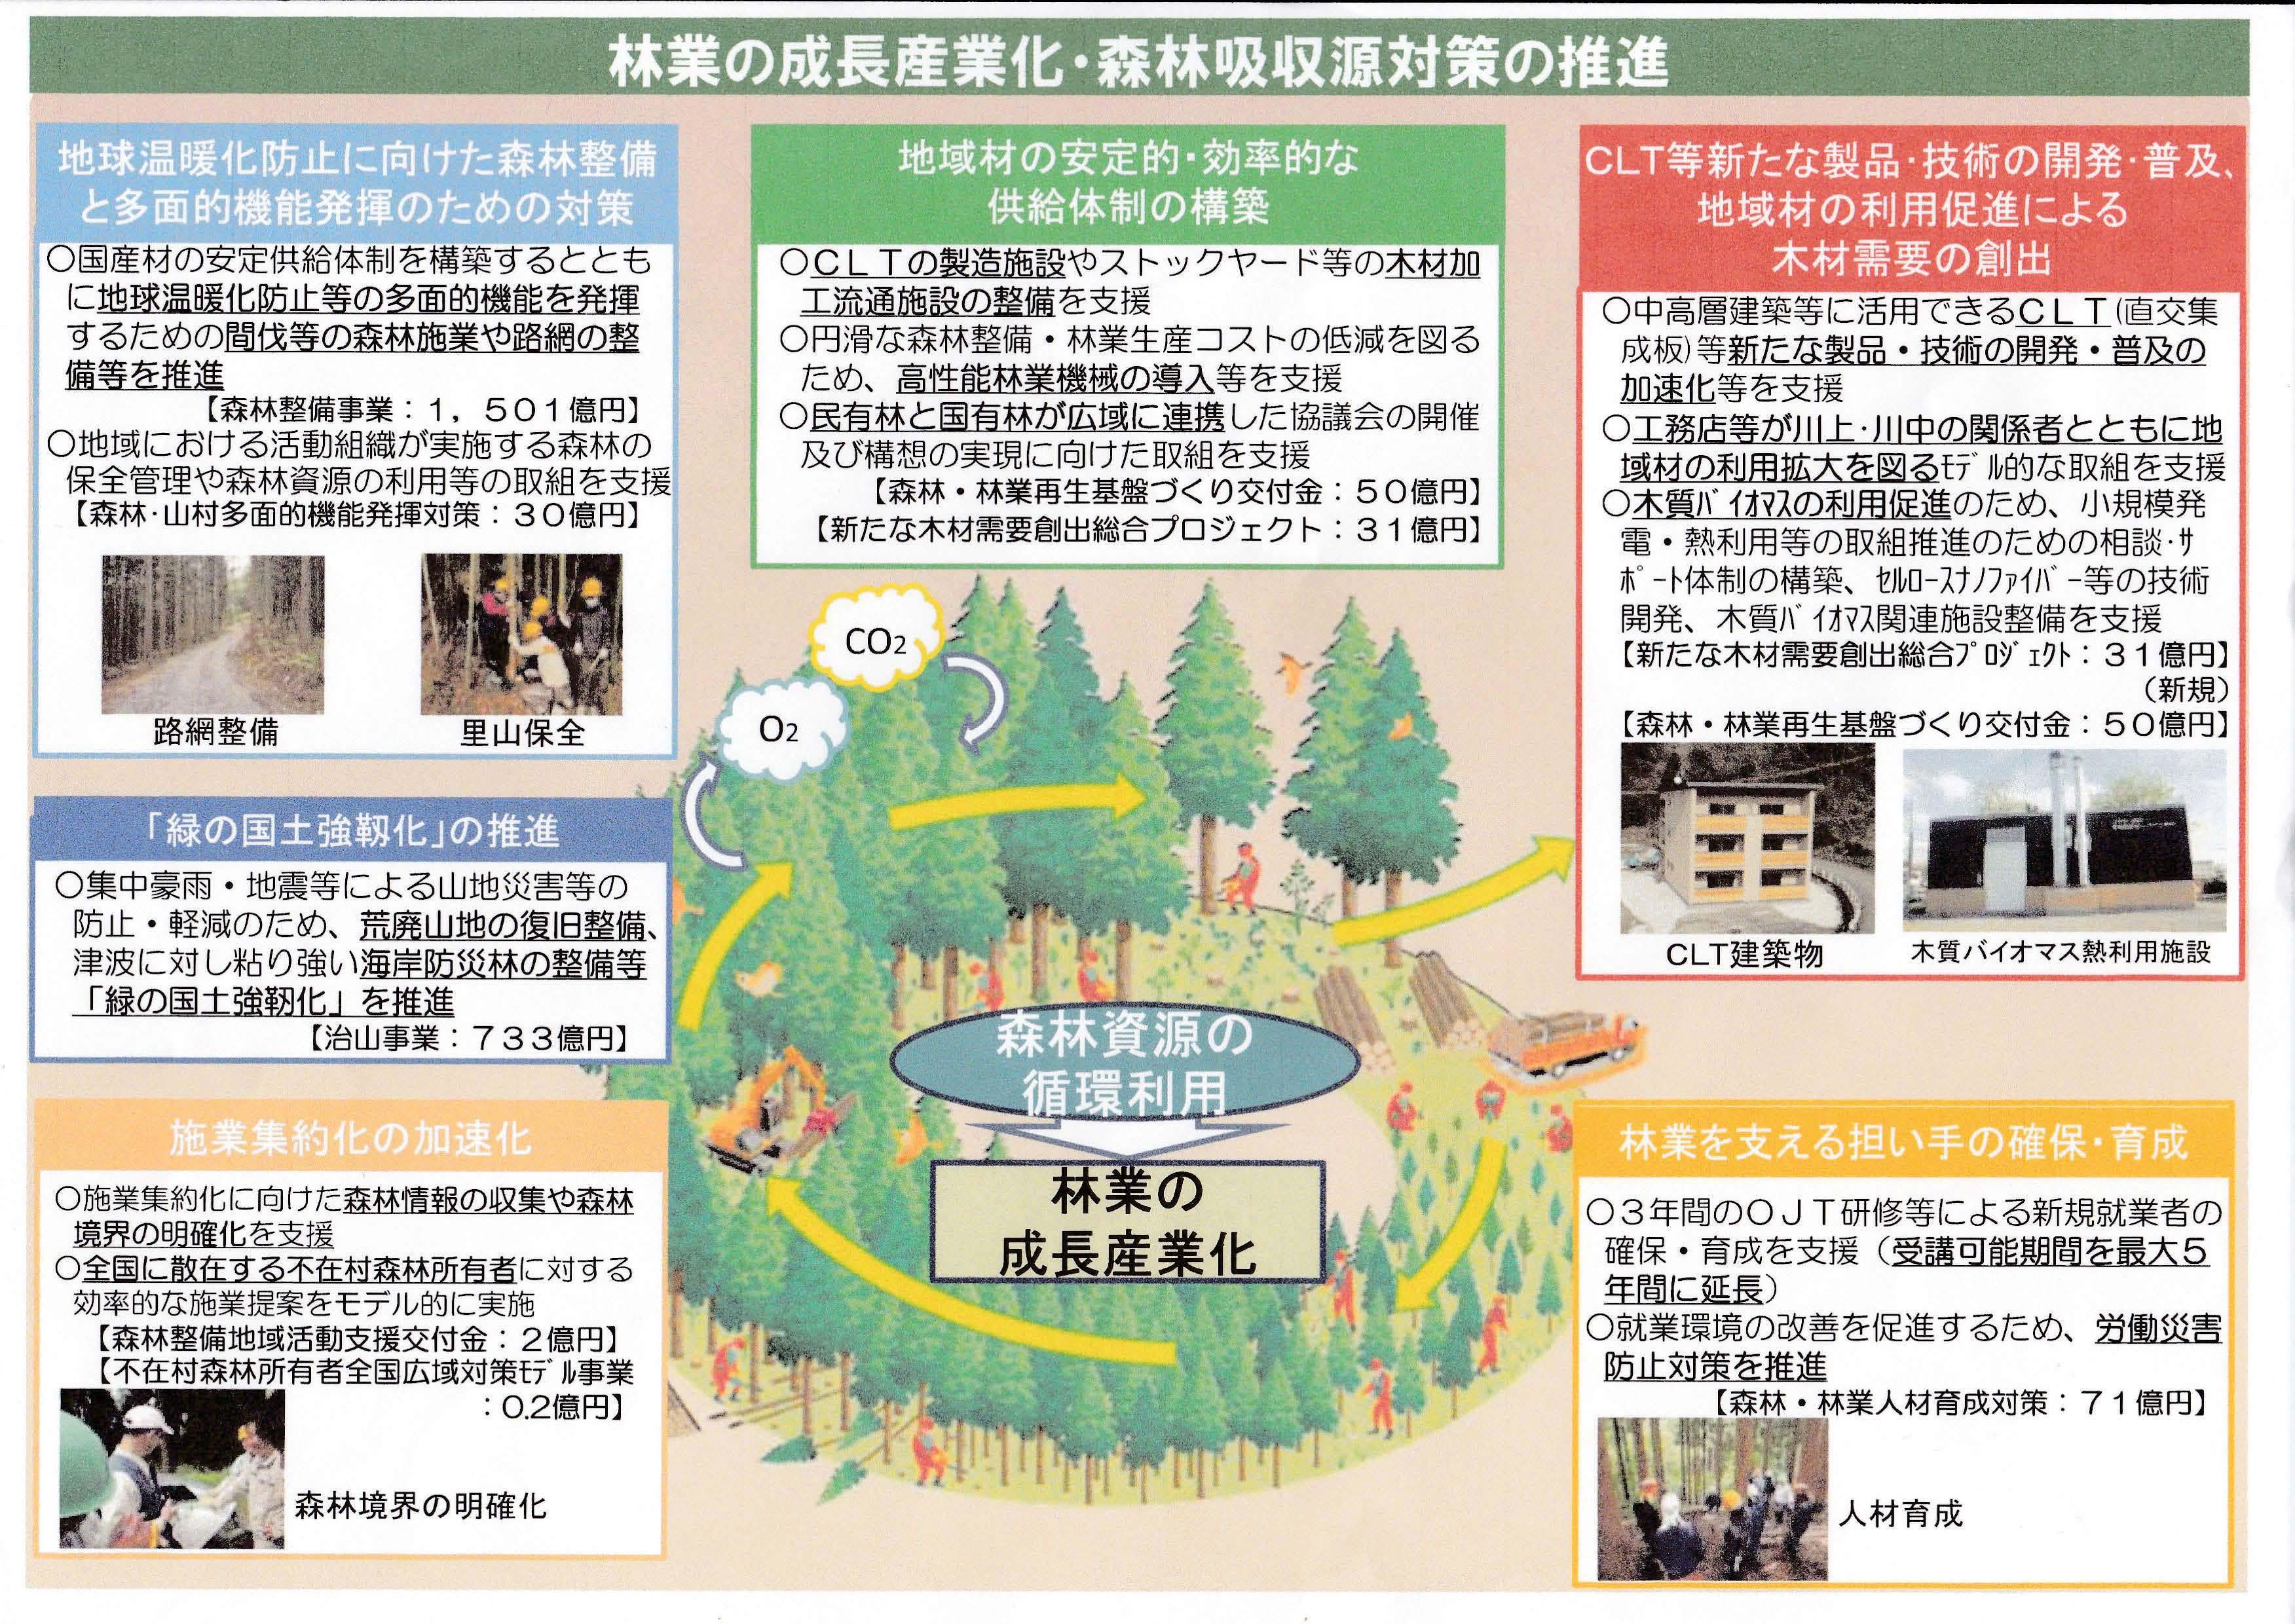 林業の成長産業化